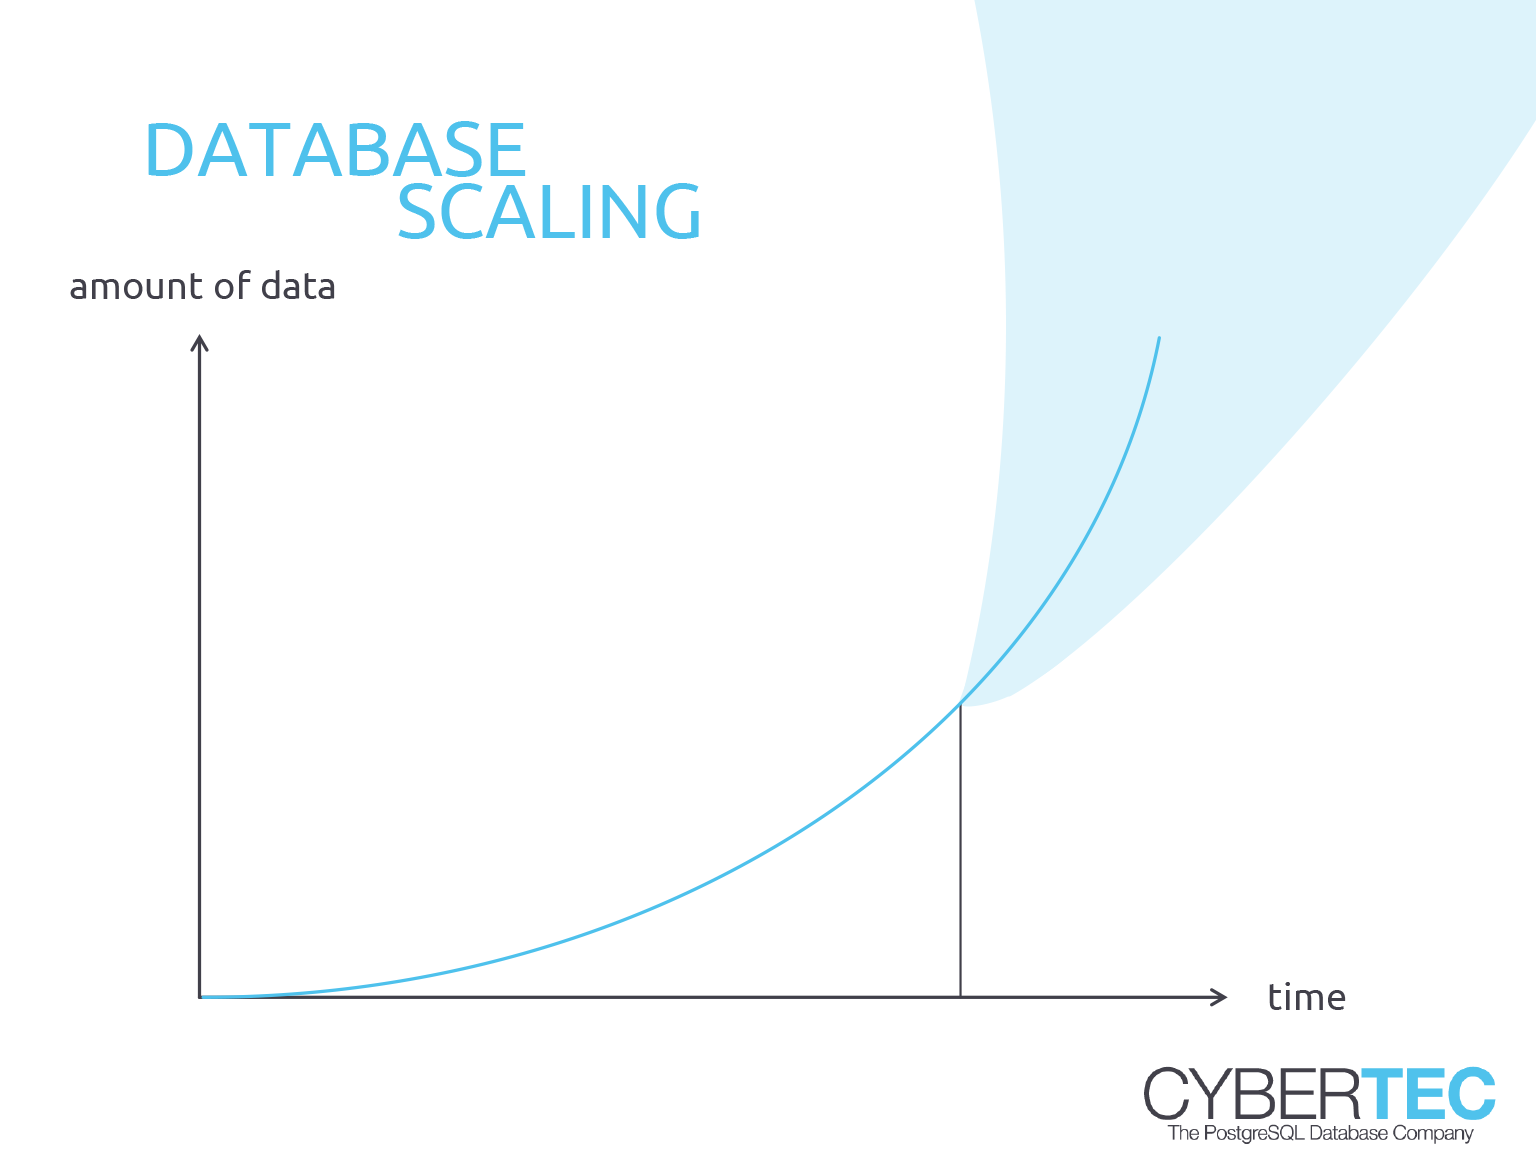 PostgreSQL performance and scalability - Database scaling